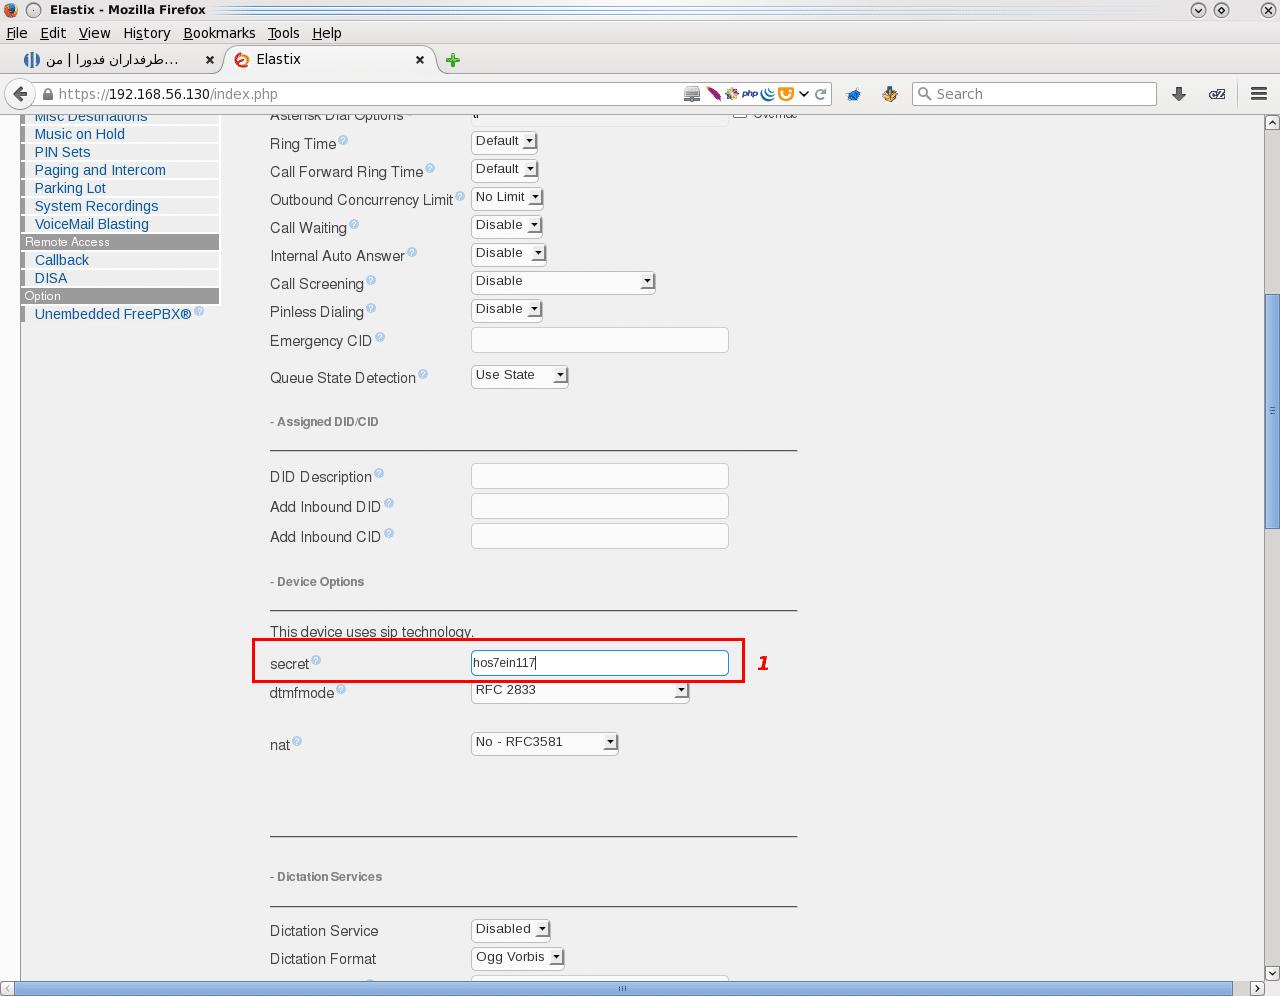 3-sip-extension-on-elastix-fedorafans.com